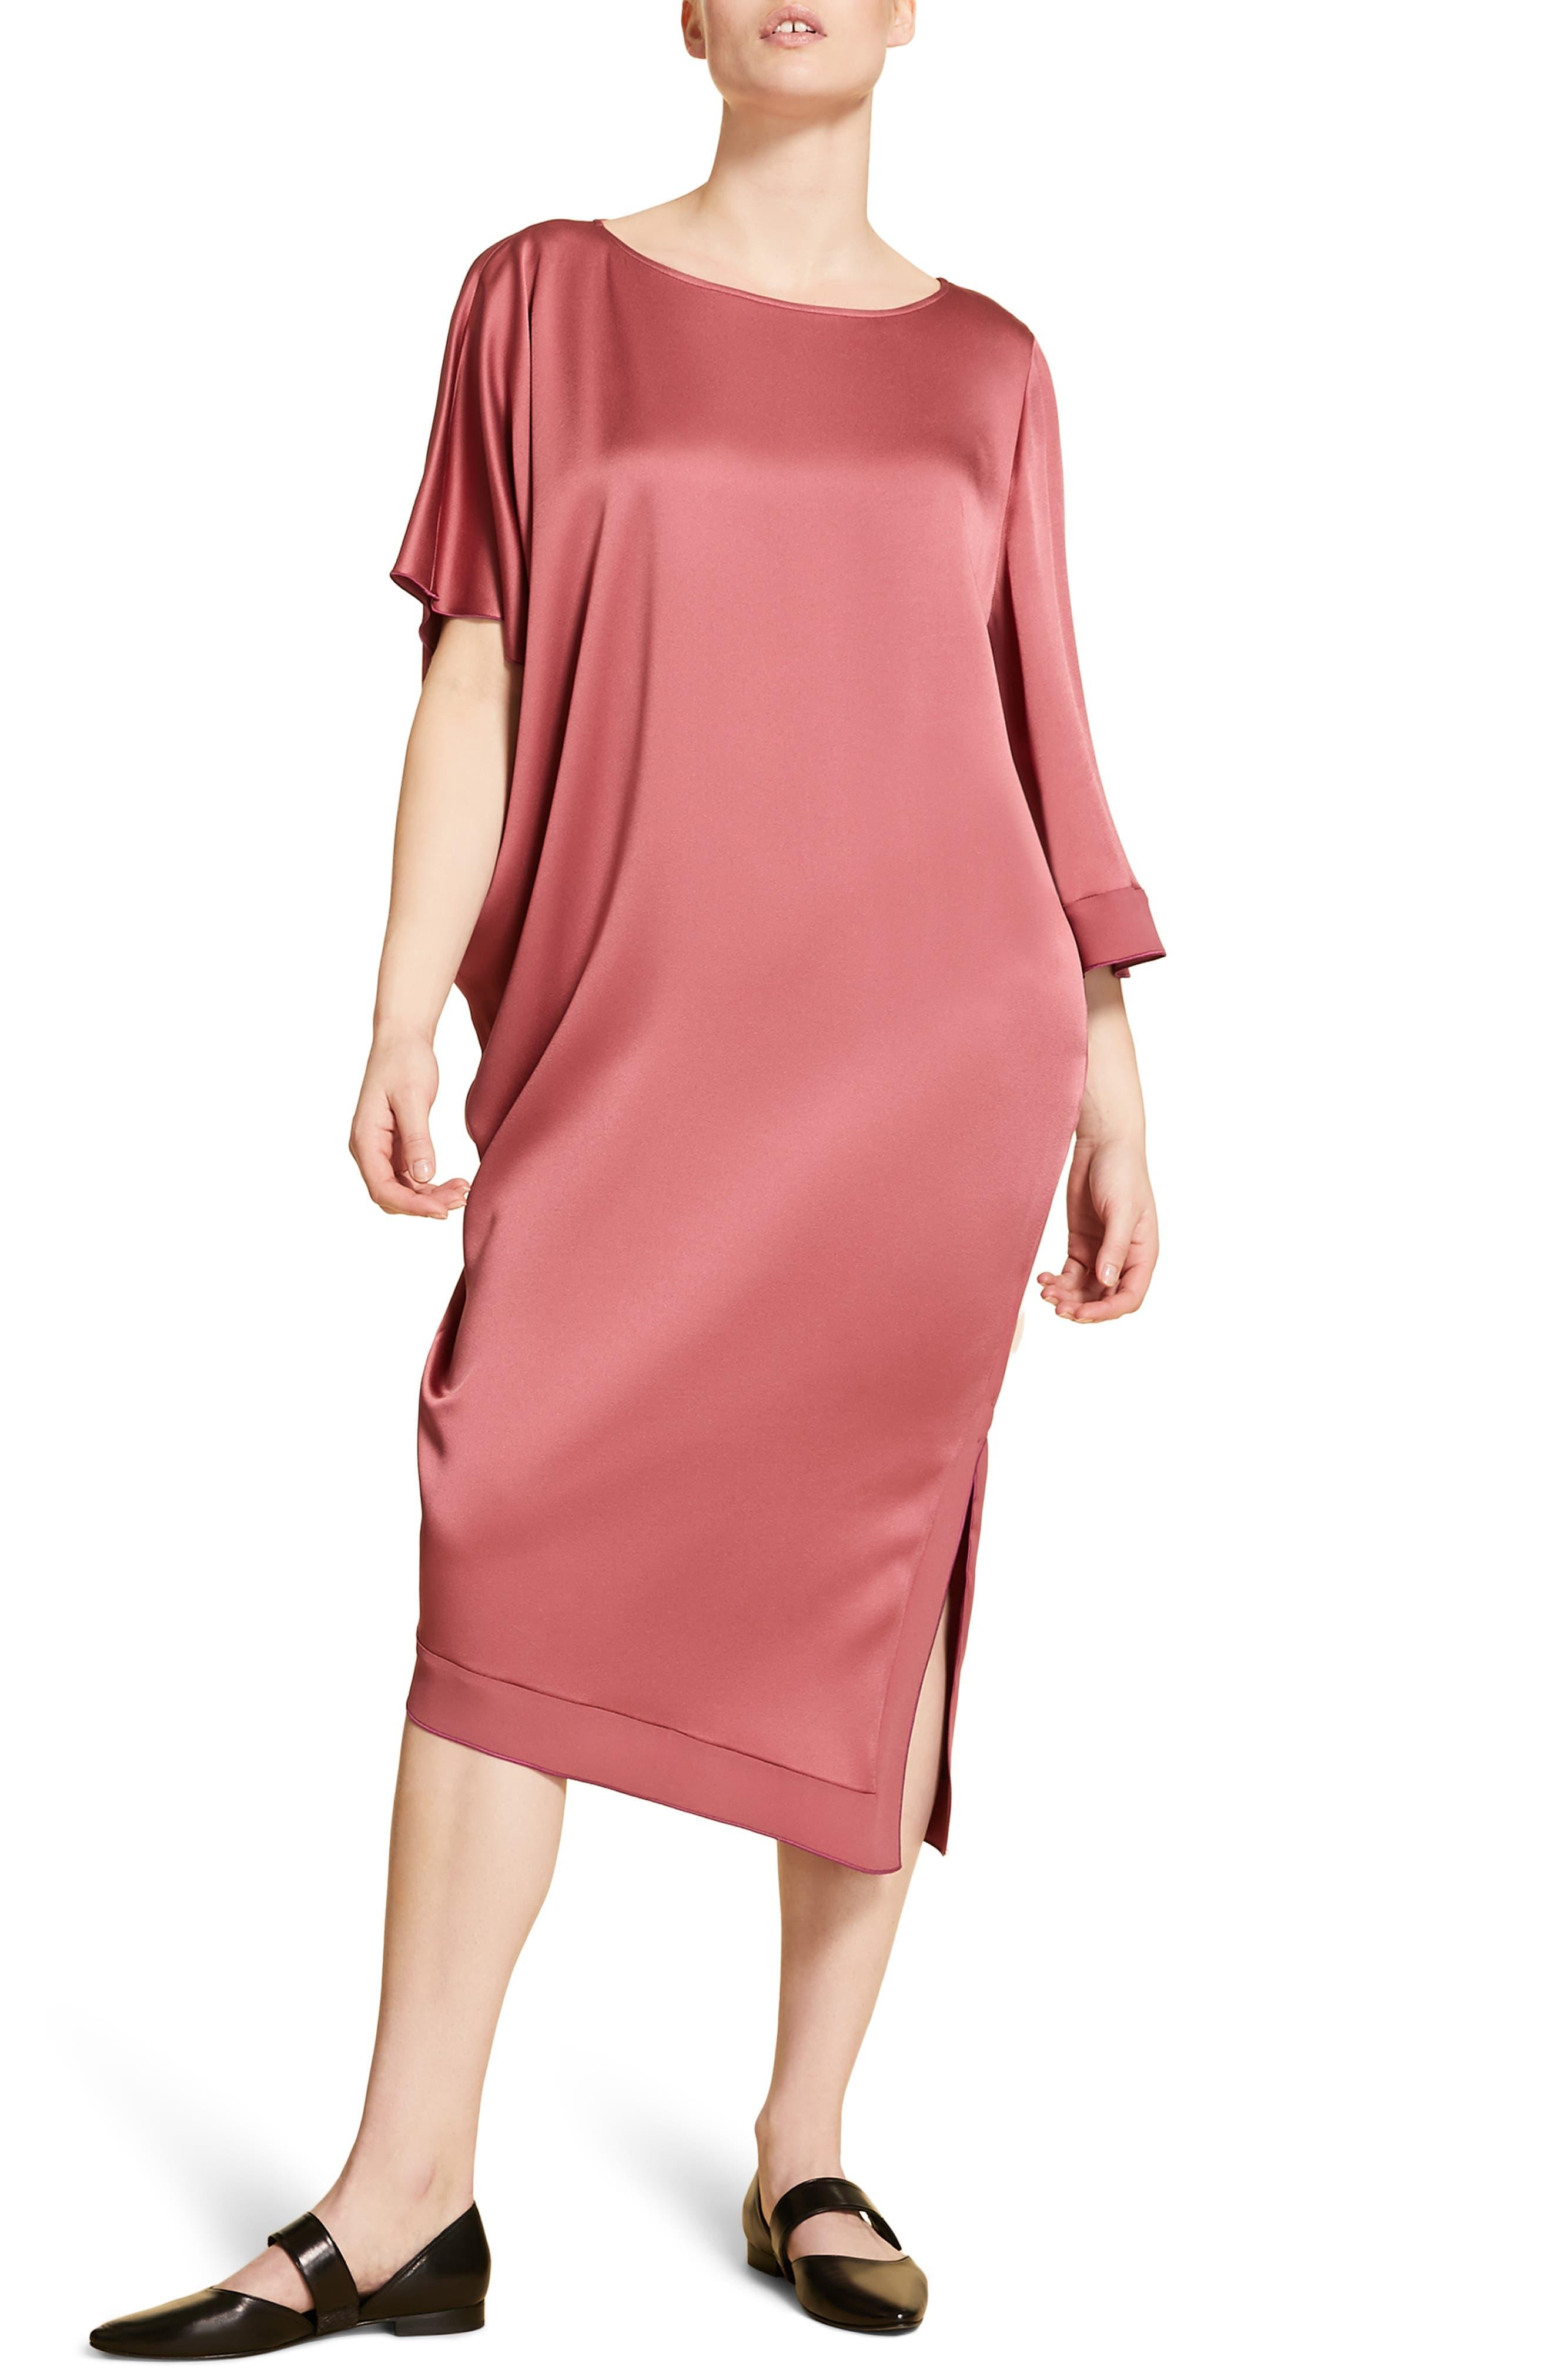 Plus Size Marina Rinaldi Divinita Asymmetrical Dress, Burgundy